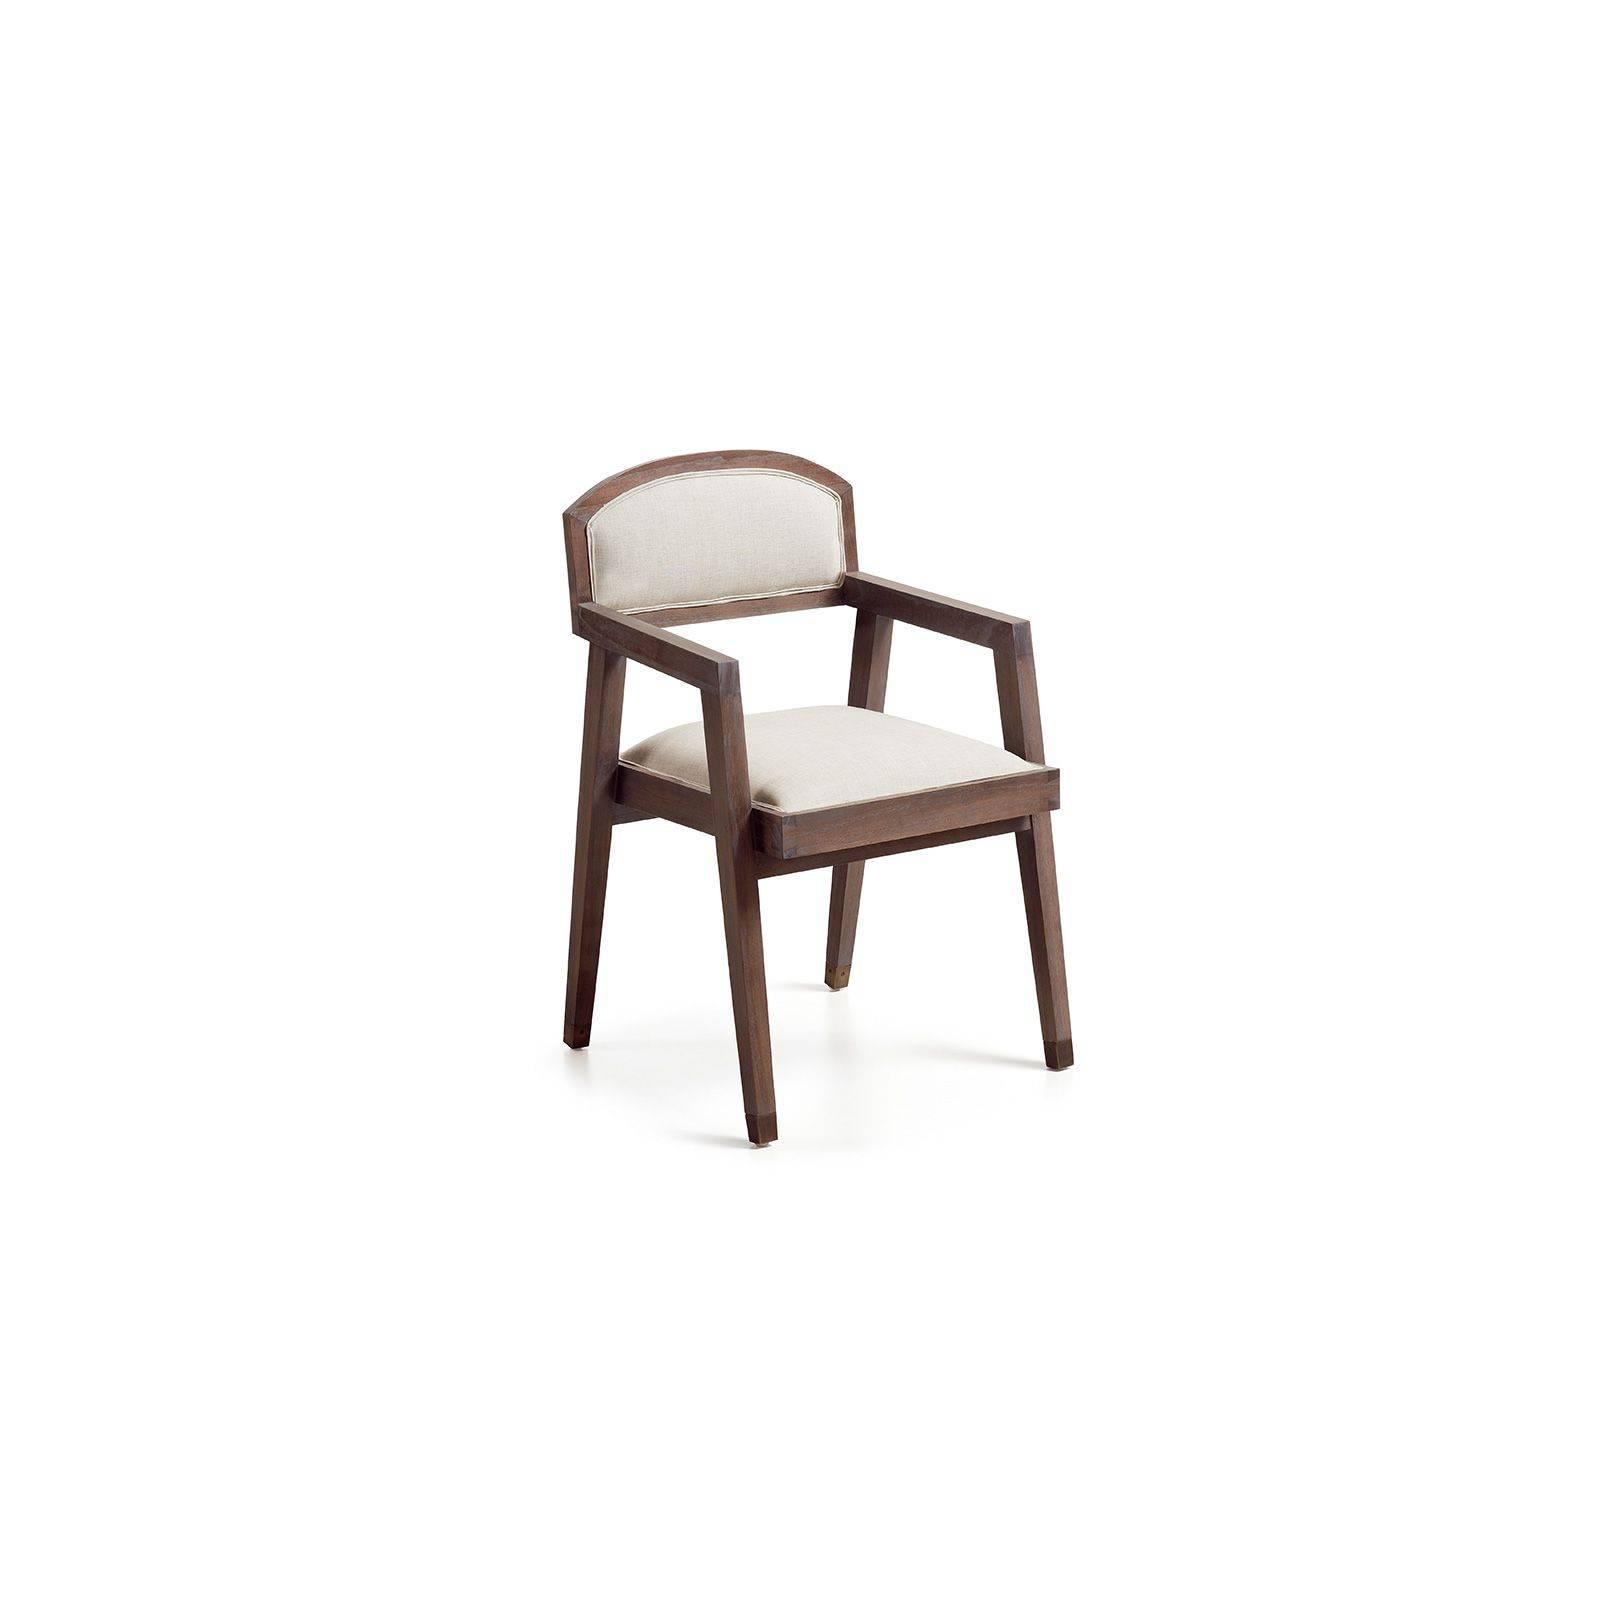 chaise vintage accoudoir assise en bois massif et tissu. Black Bedroom Furniture Sets. Home Design Ideas